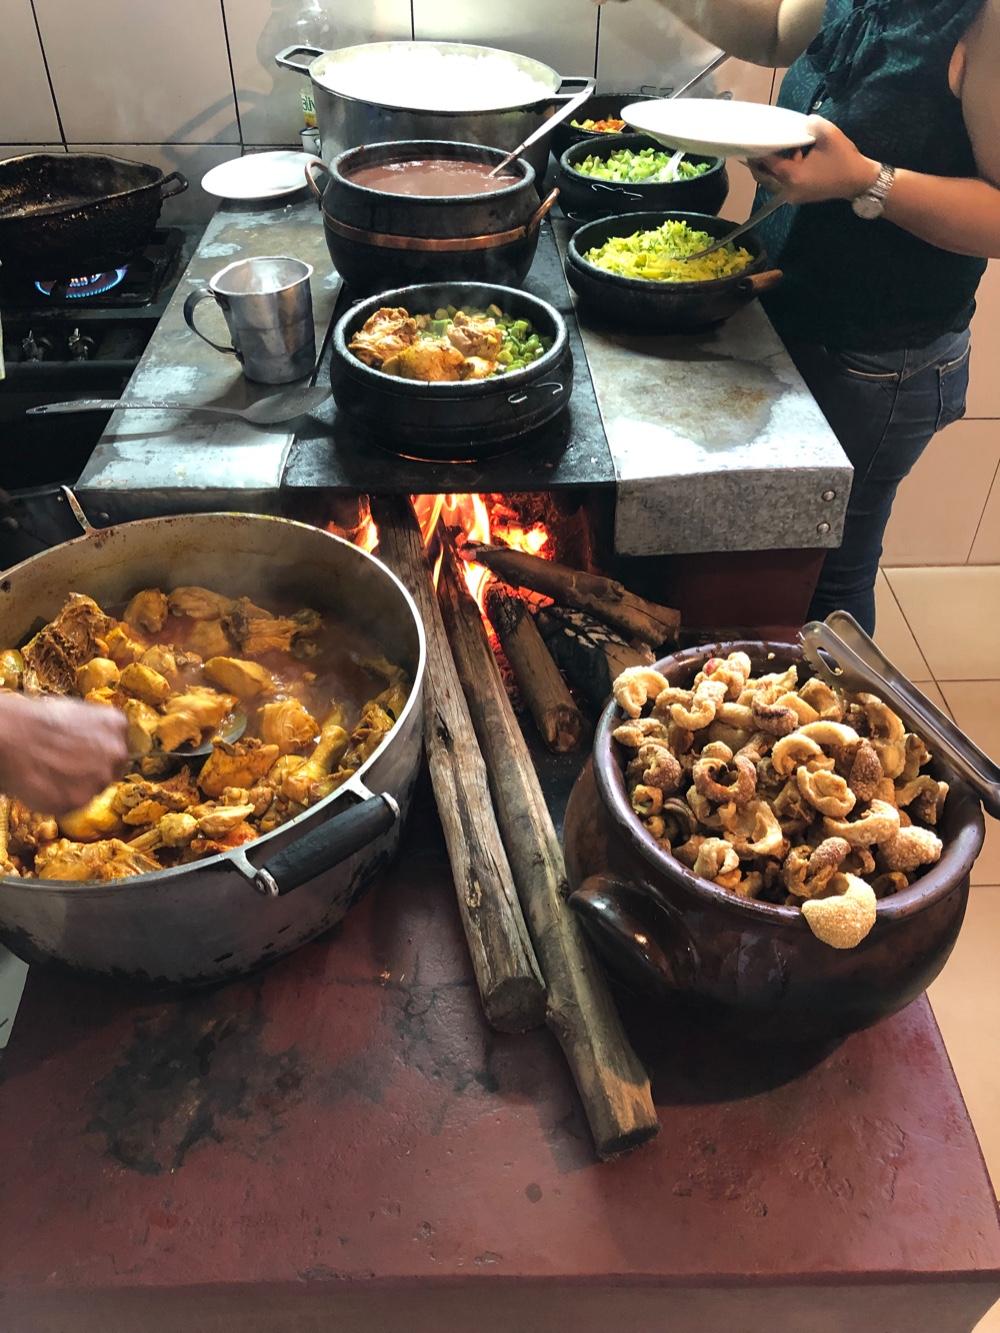 Simplicidade, sabor e aconchego no restaurante Tempero da Angela